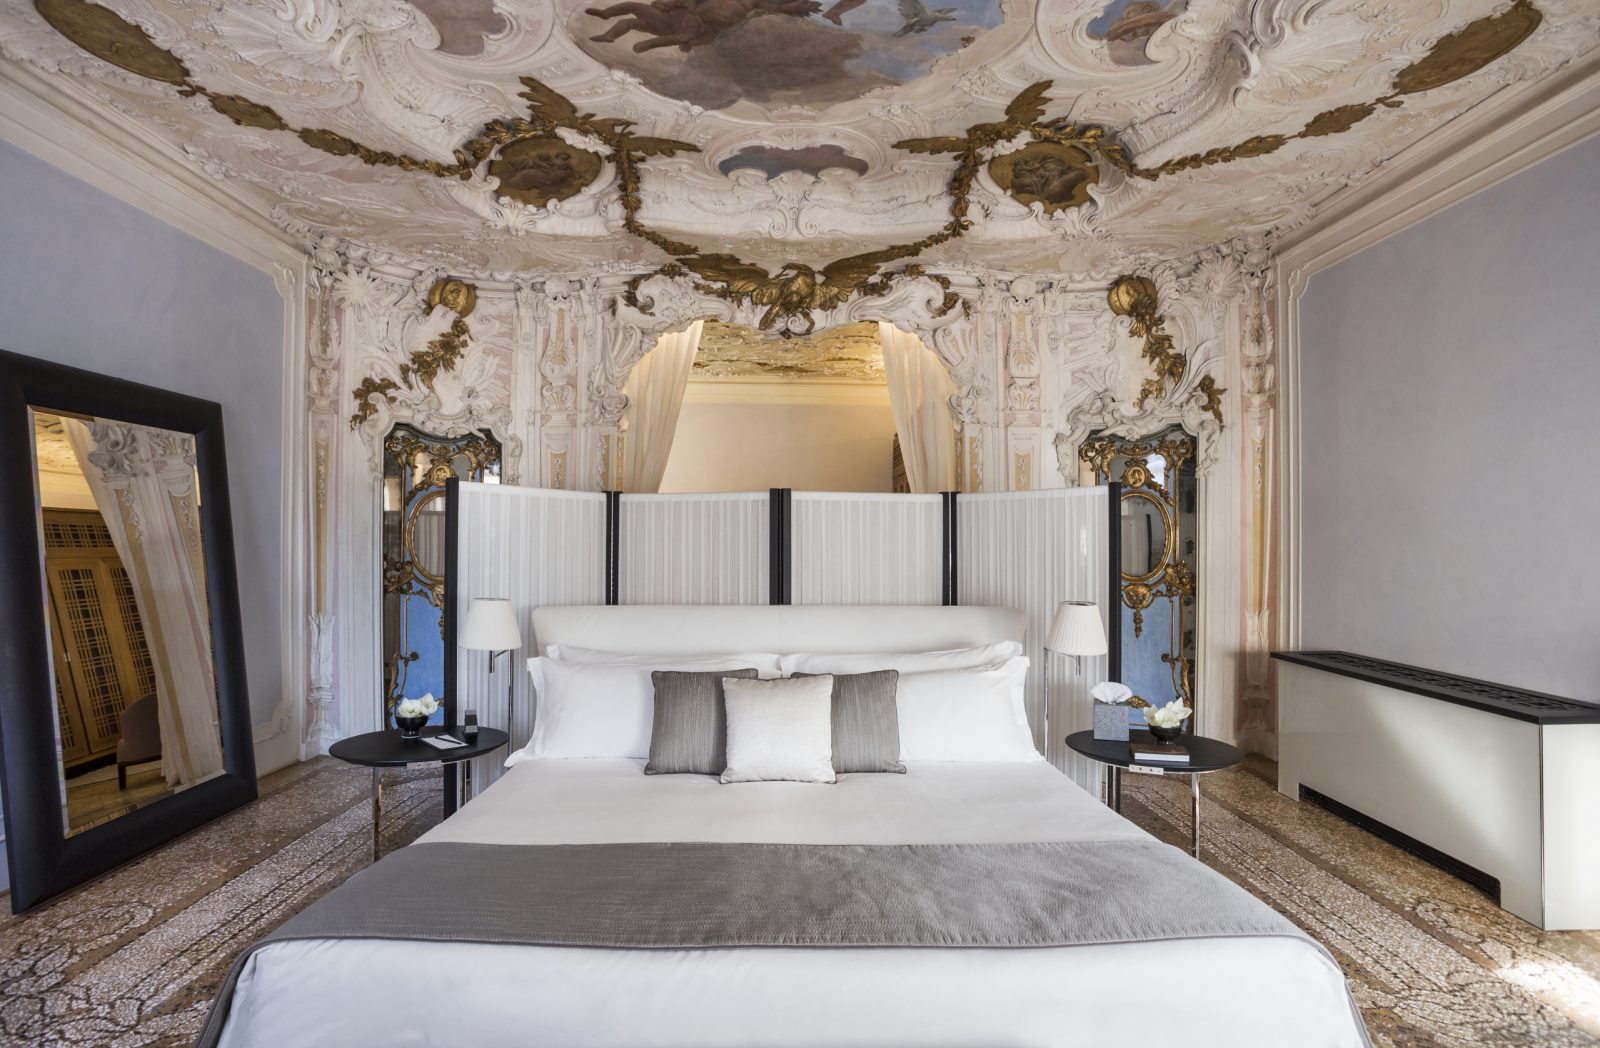 Alcova Tiepolo Suite, Aman Venice